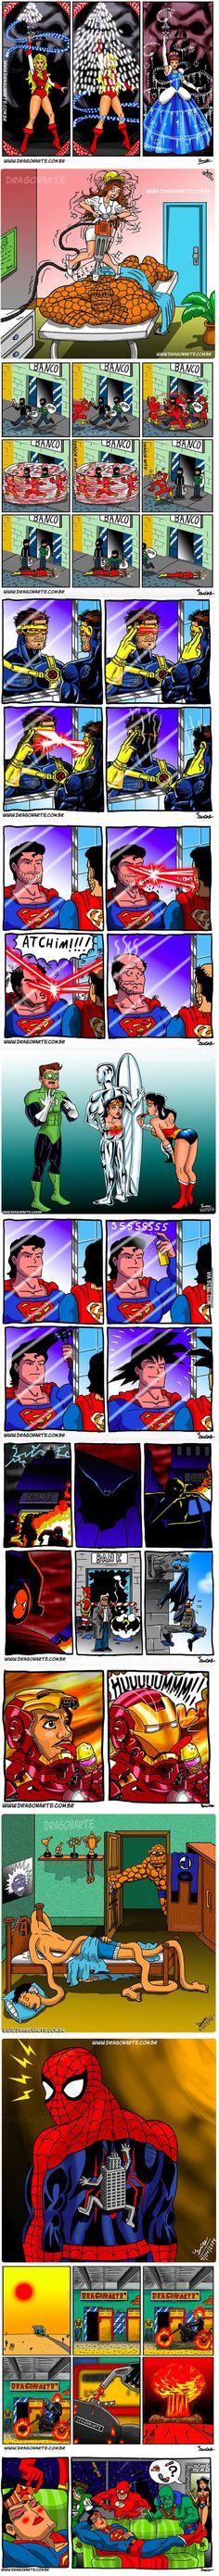 The Funniest Superhero Comics Collection (Part 4)